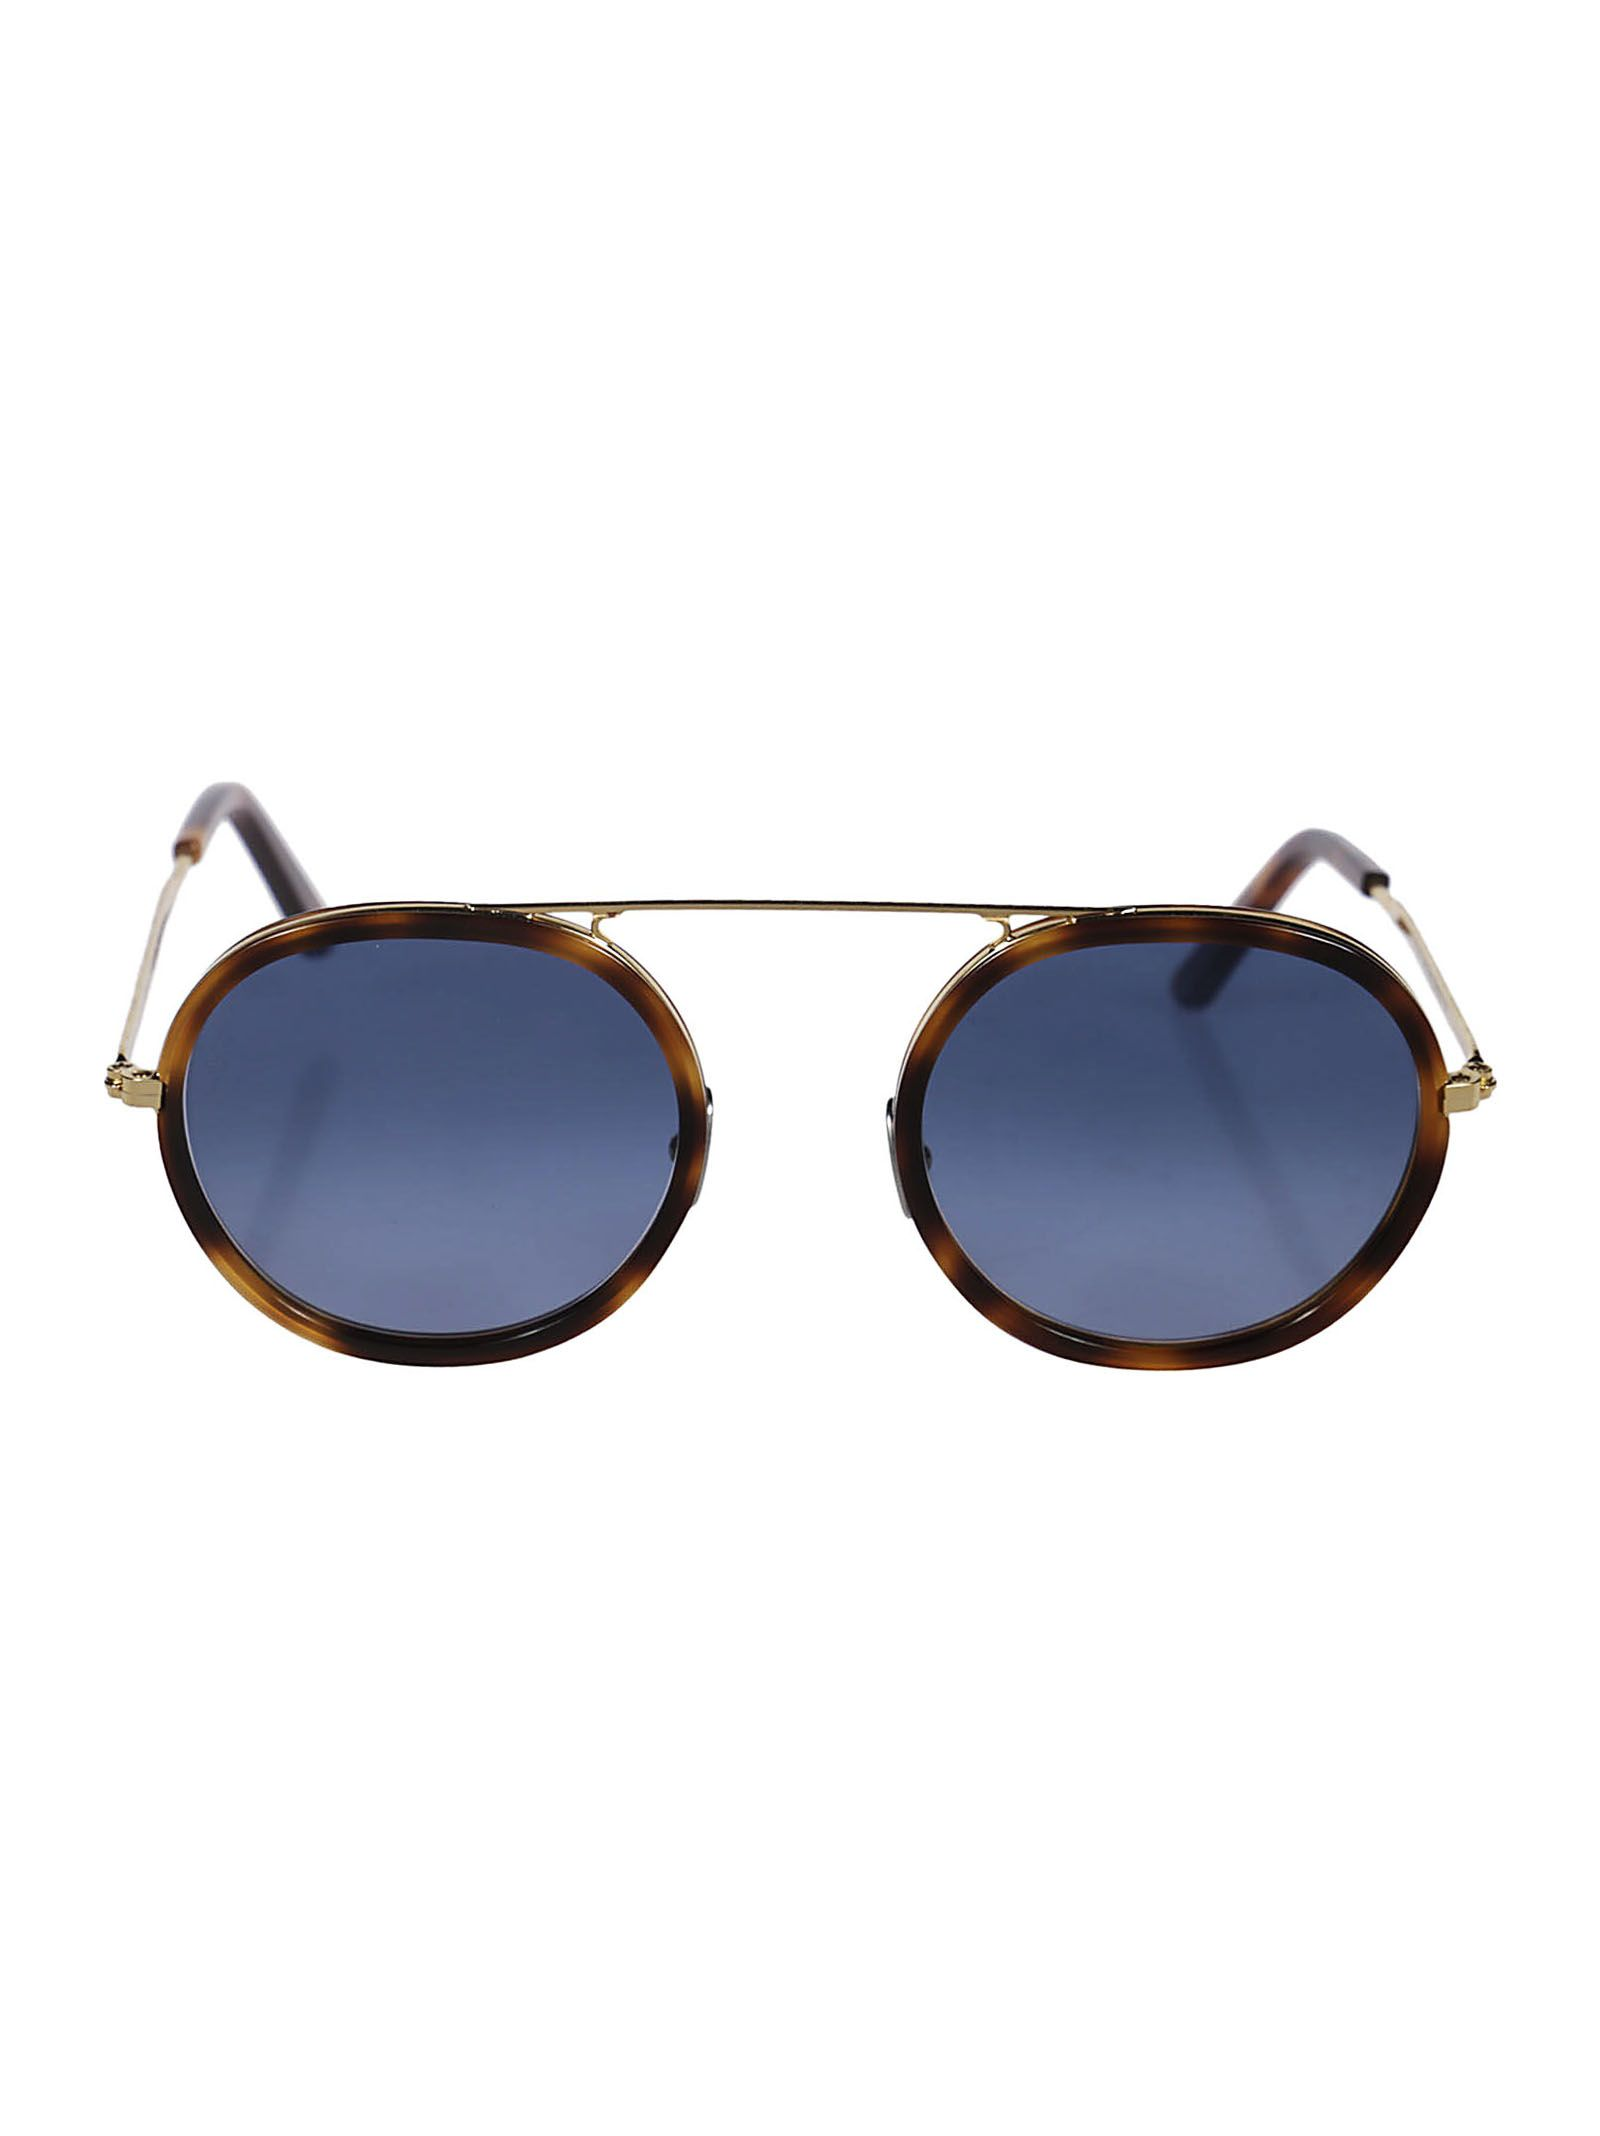 L.G.R Lgr Round Sunglasses in Gold/Havana